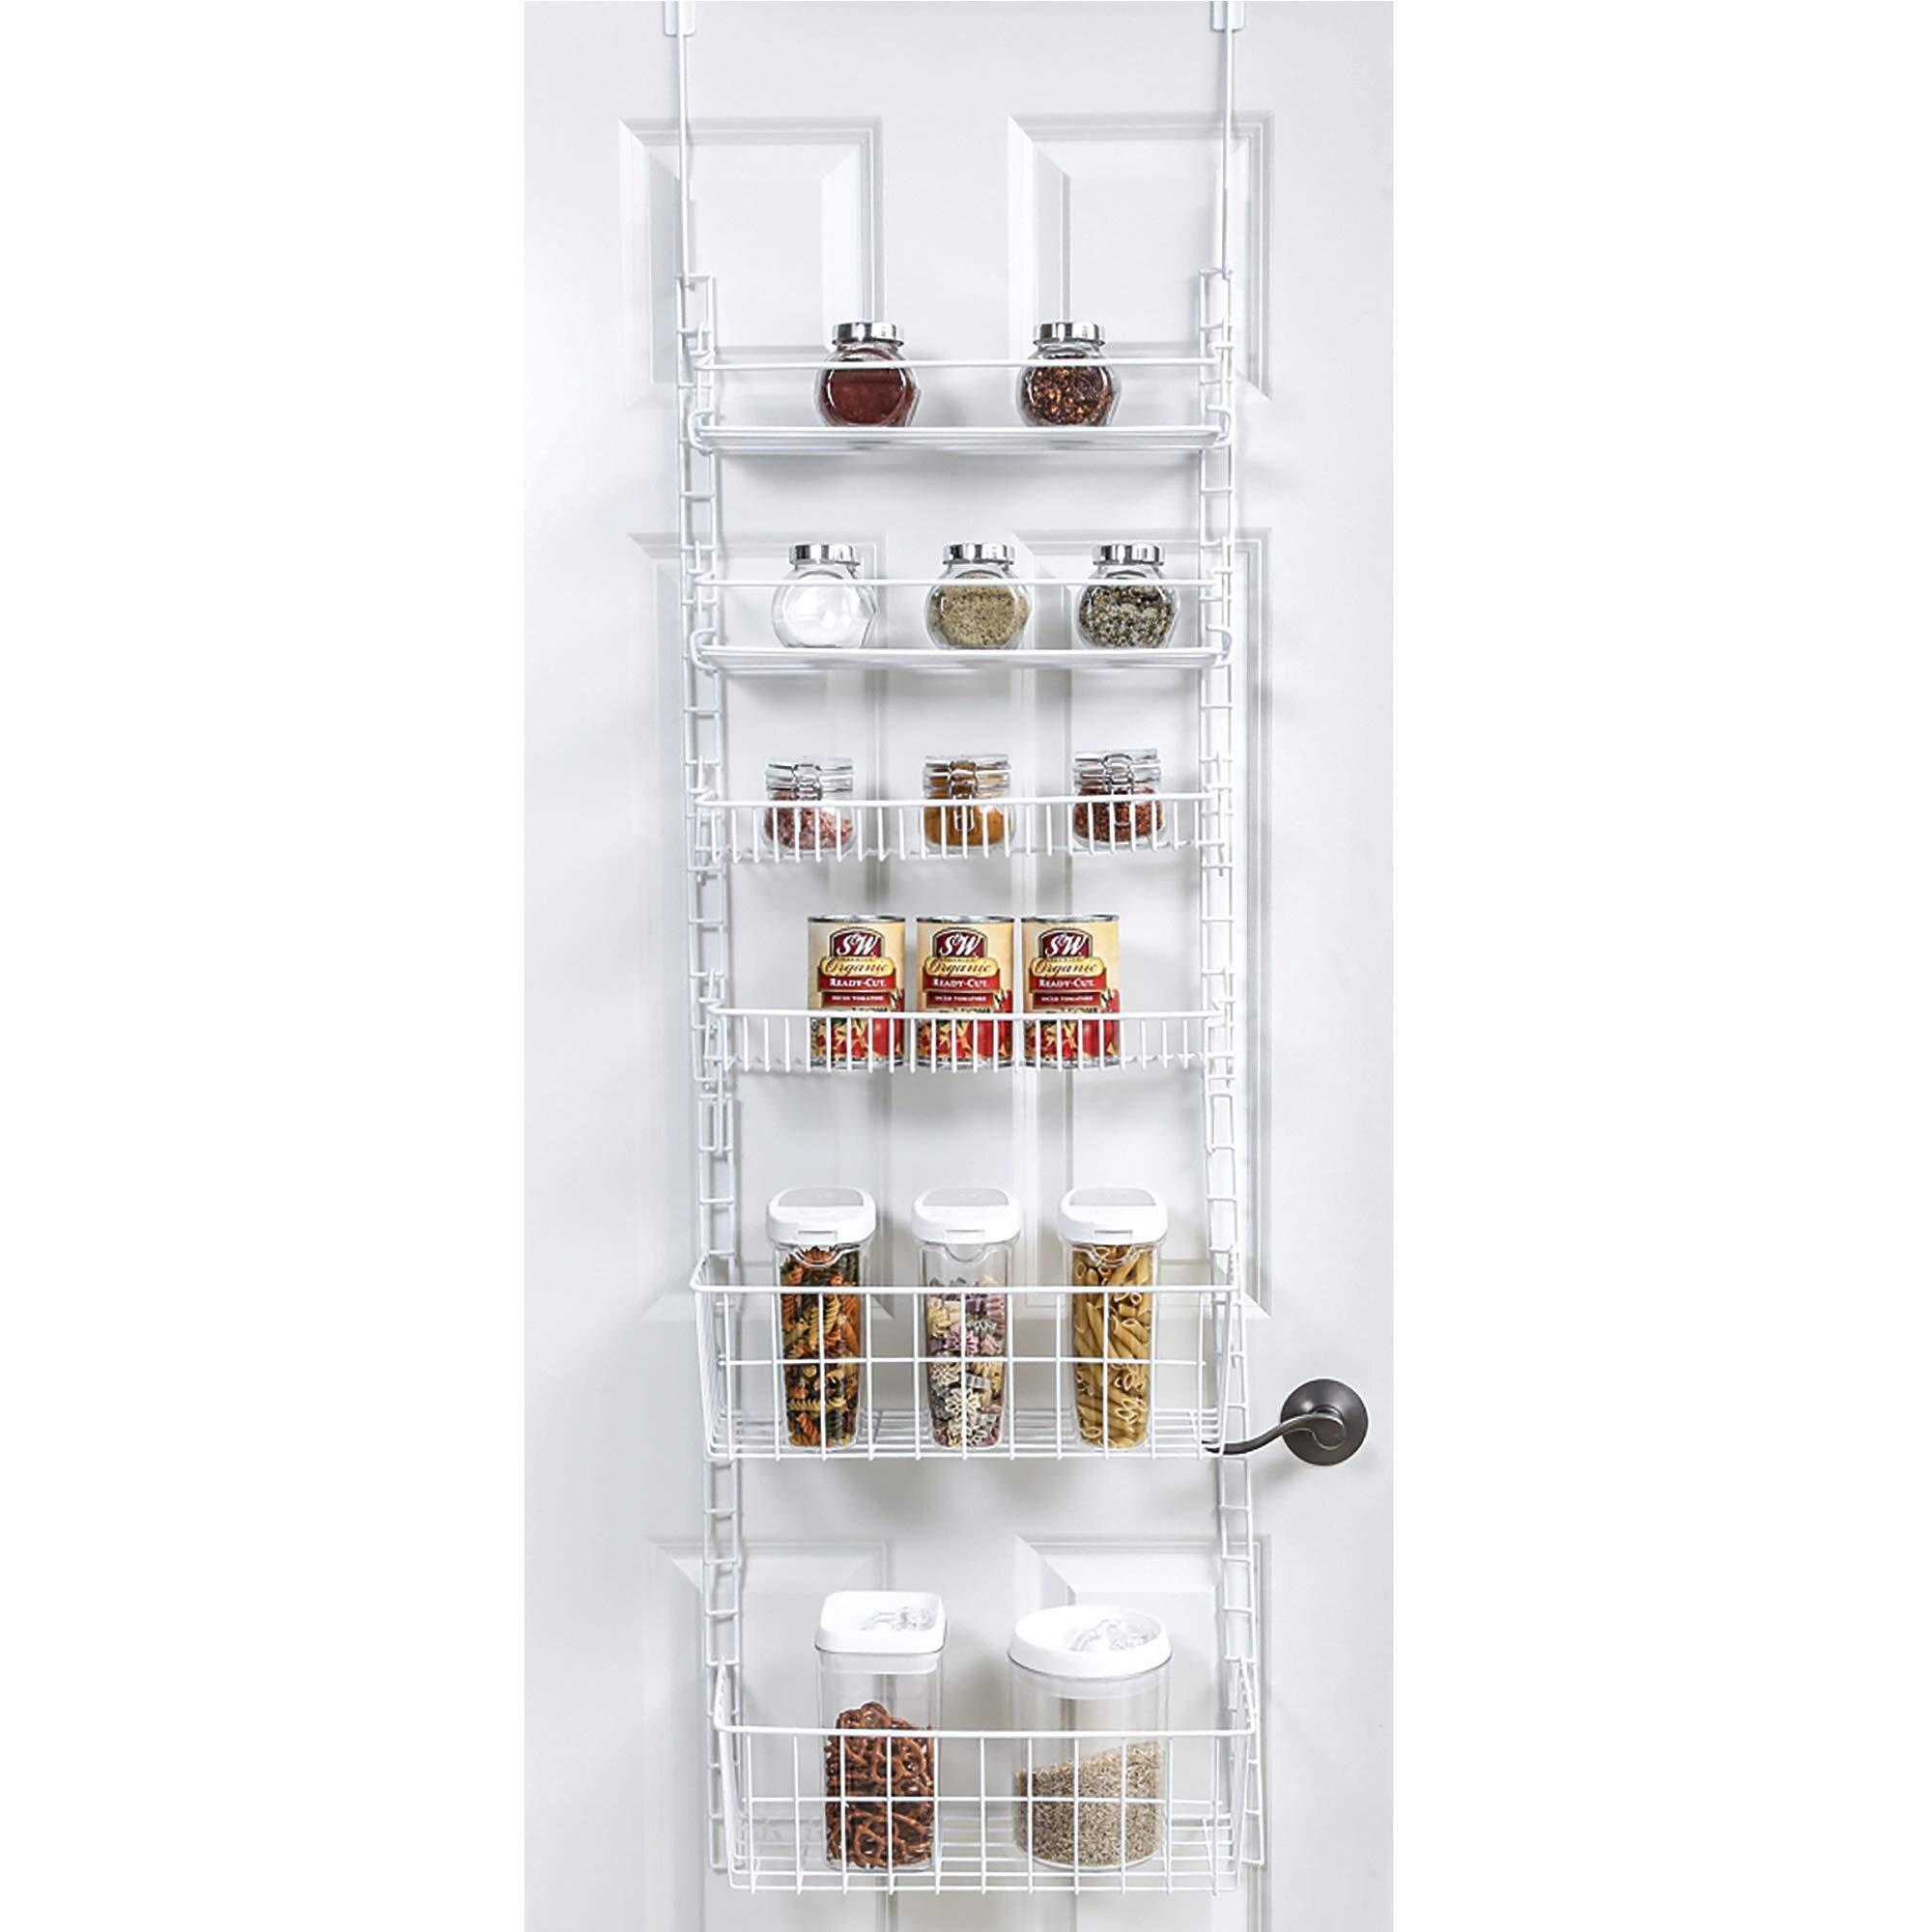 Adjustable Pantry Organizer Rack W/ 20 Adjustable Shelves Steel Construction  W/ Hooks & Screws   For Cans, Food, Misc. Item   Kitchen